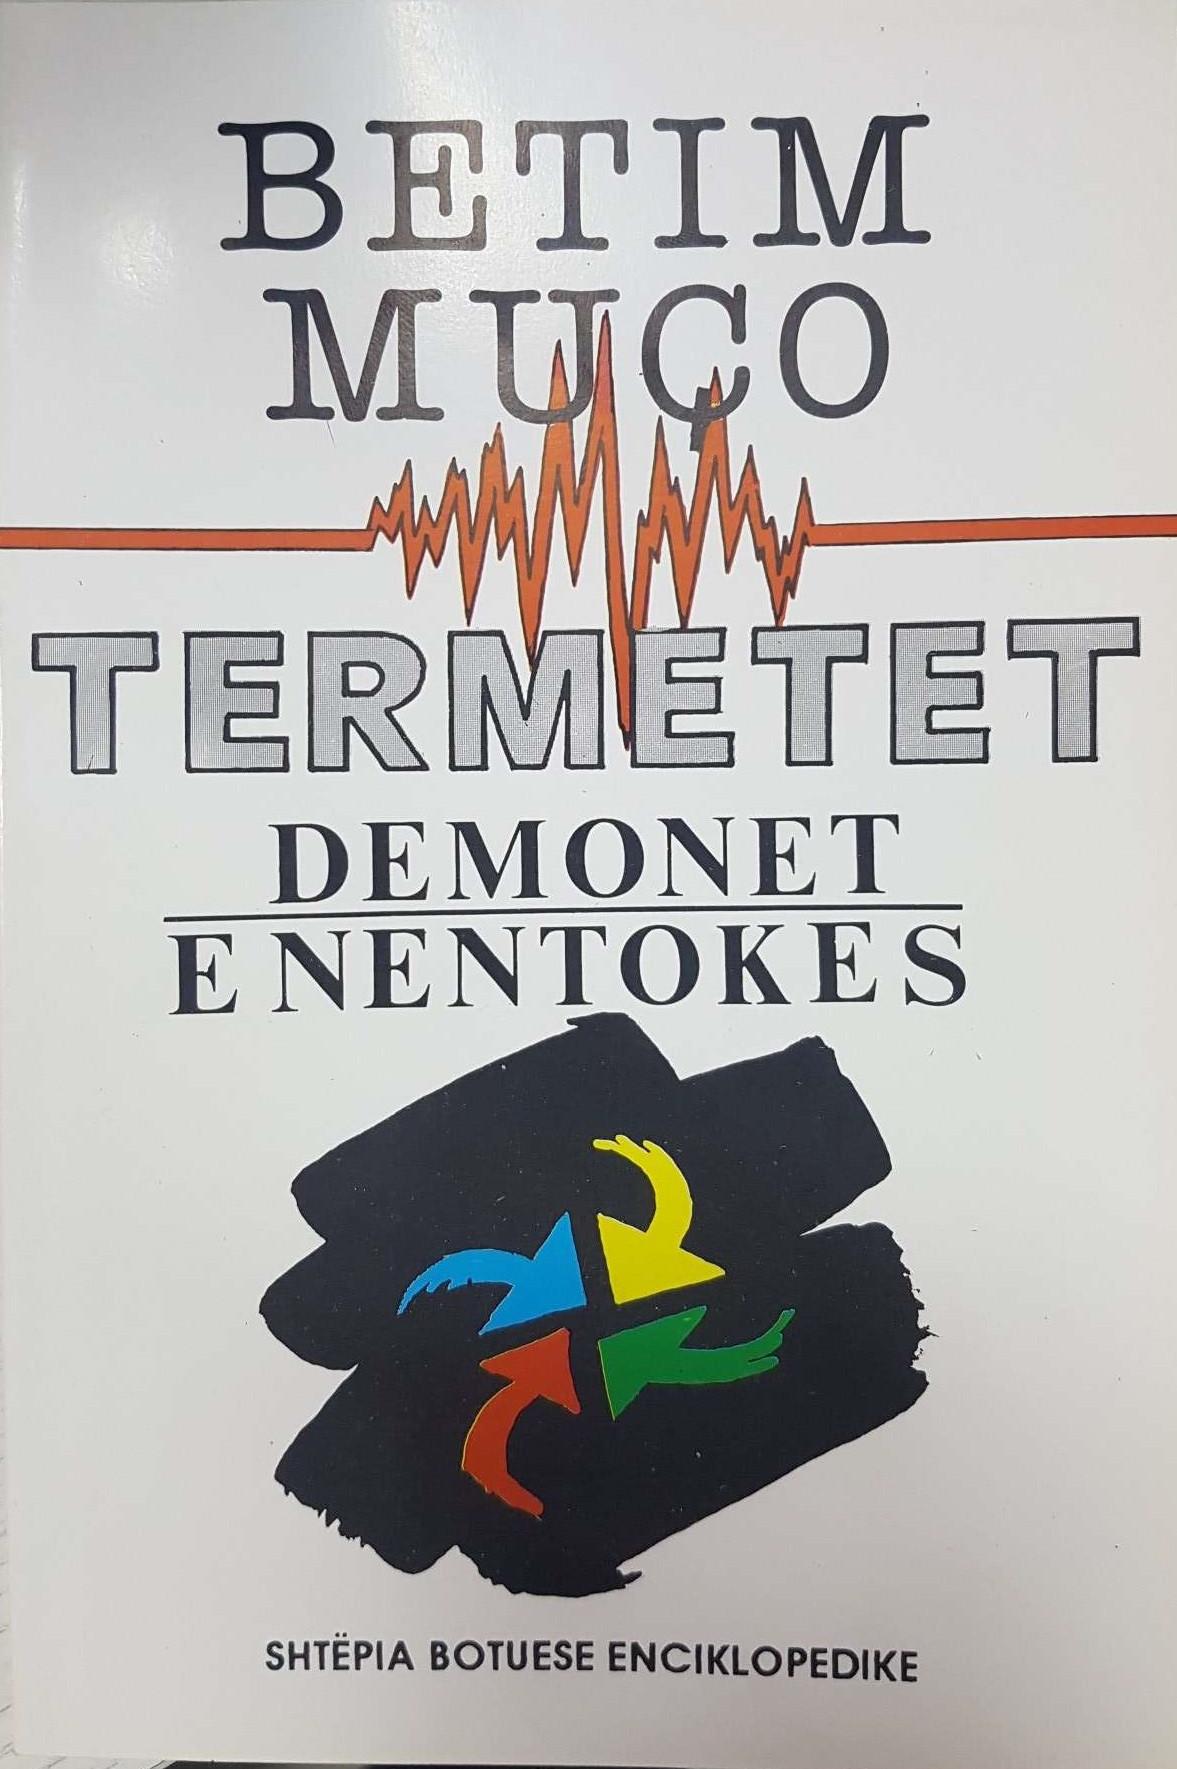 Termetet, demonet e nentokes